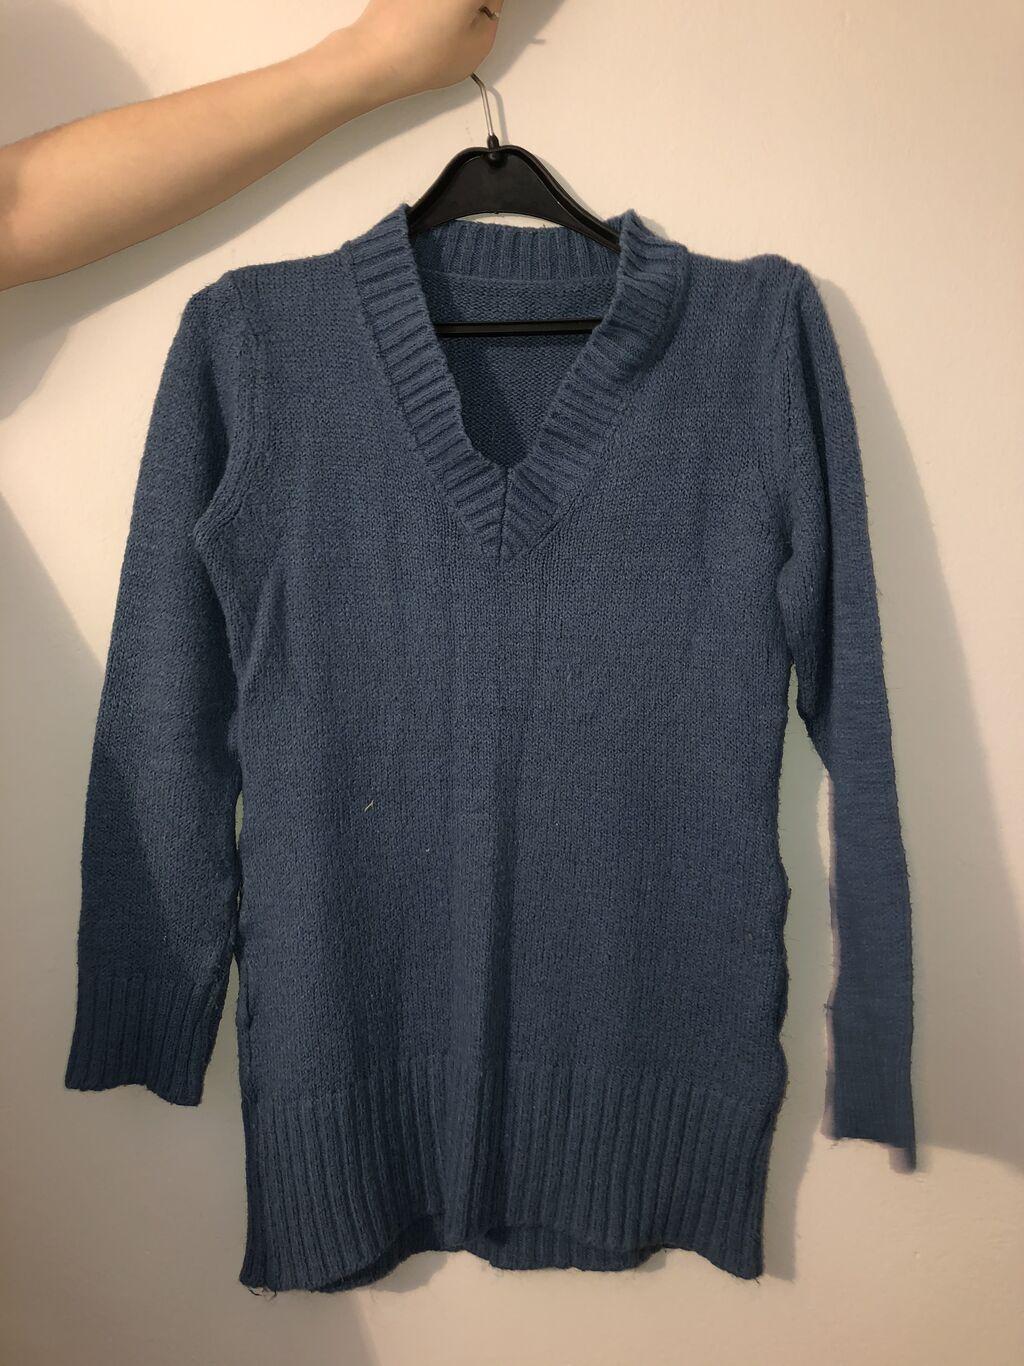 Ženski dzemper plave boje, odlično očuvan, idealan pokolon za vaše dame, cena samo 400 dinara, veličina je univerzalna